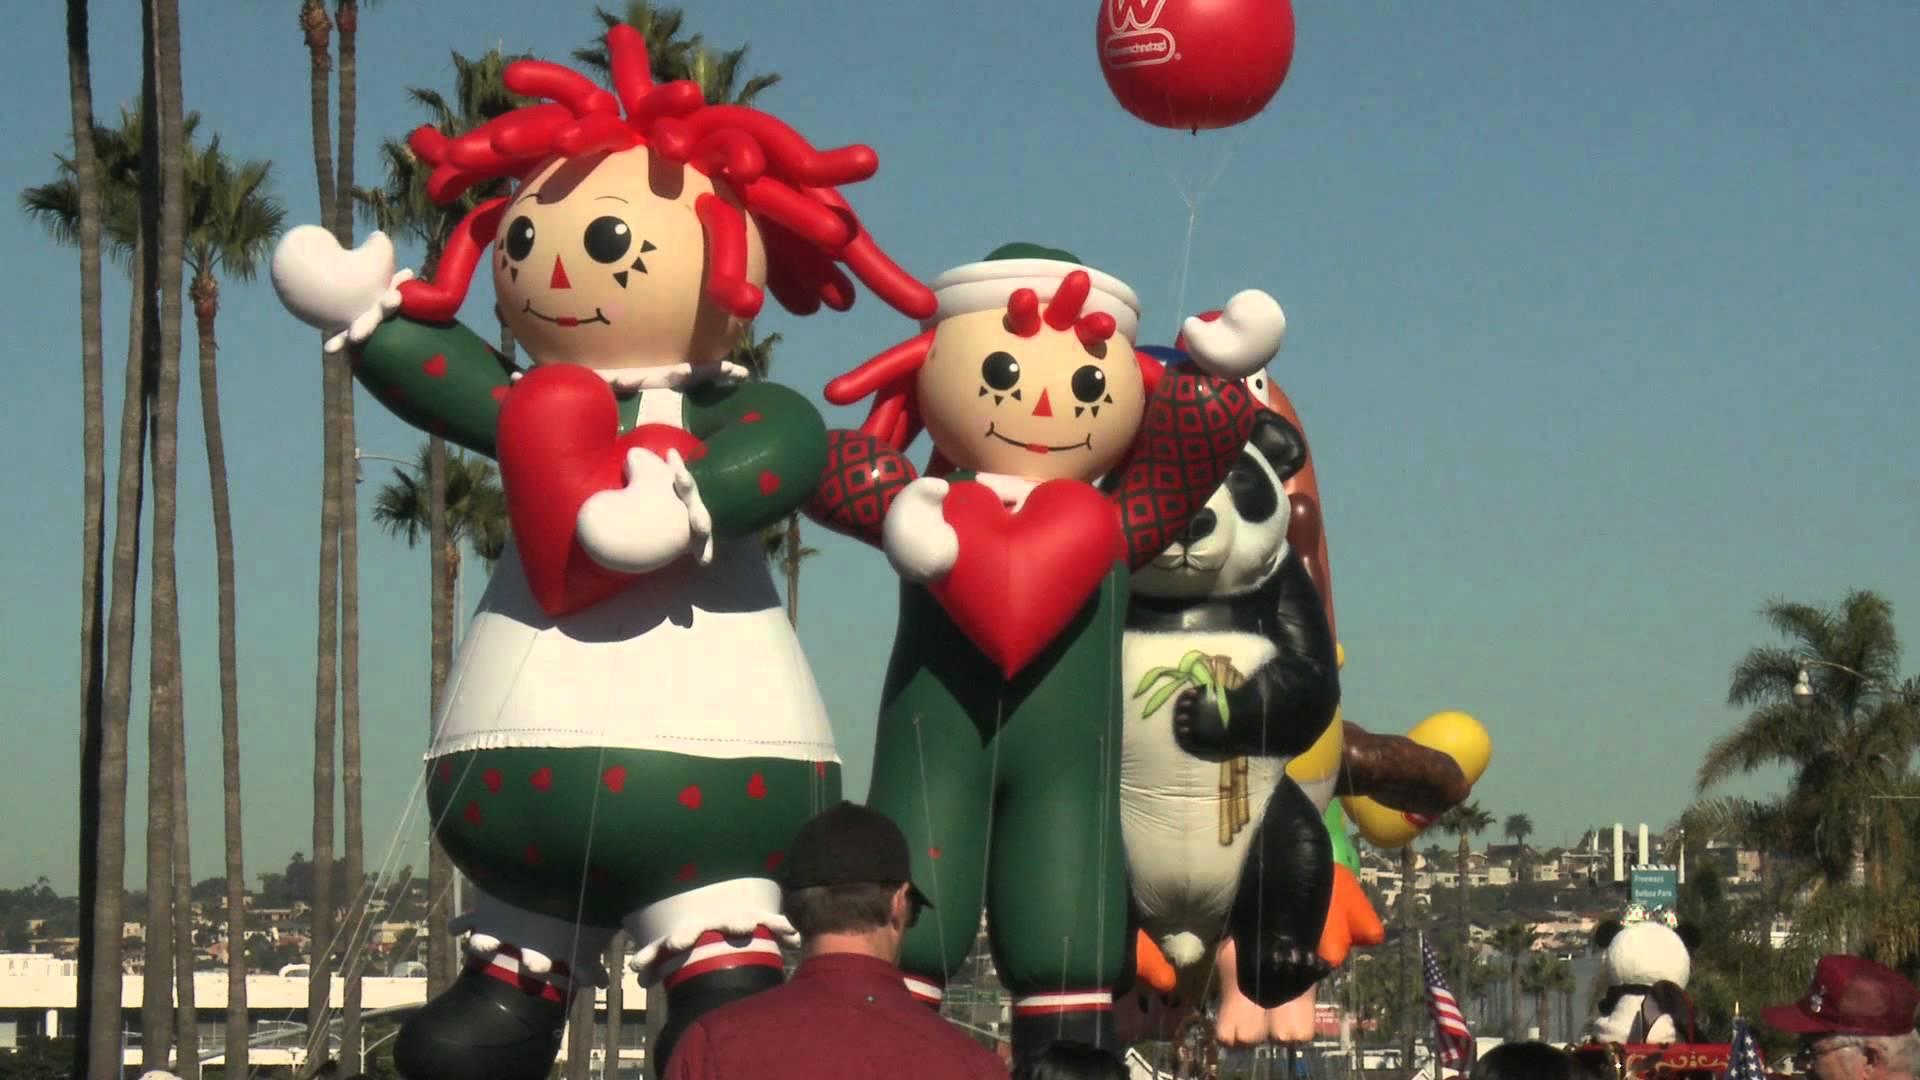 2011 Big Bay Balloon Parade